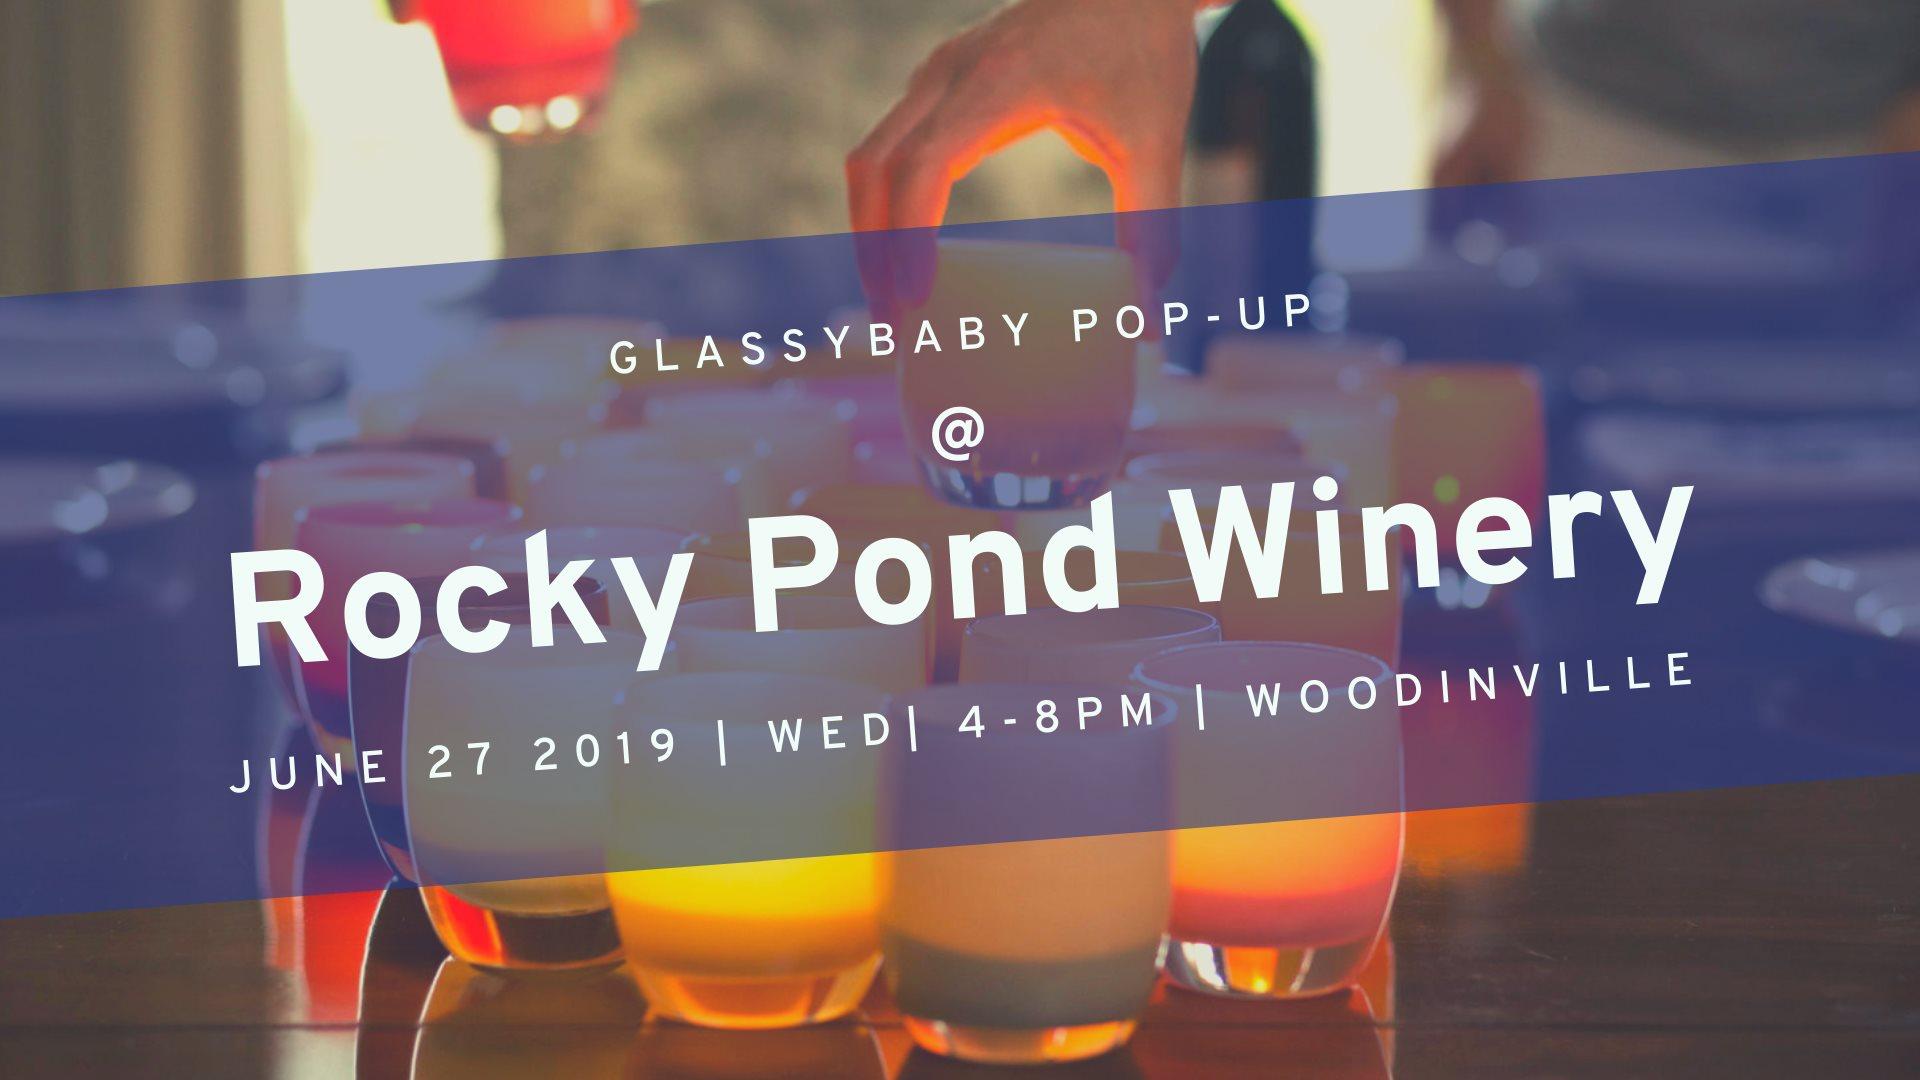 glassy baby pop up june 27, 2019